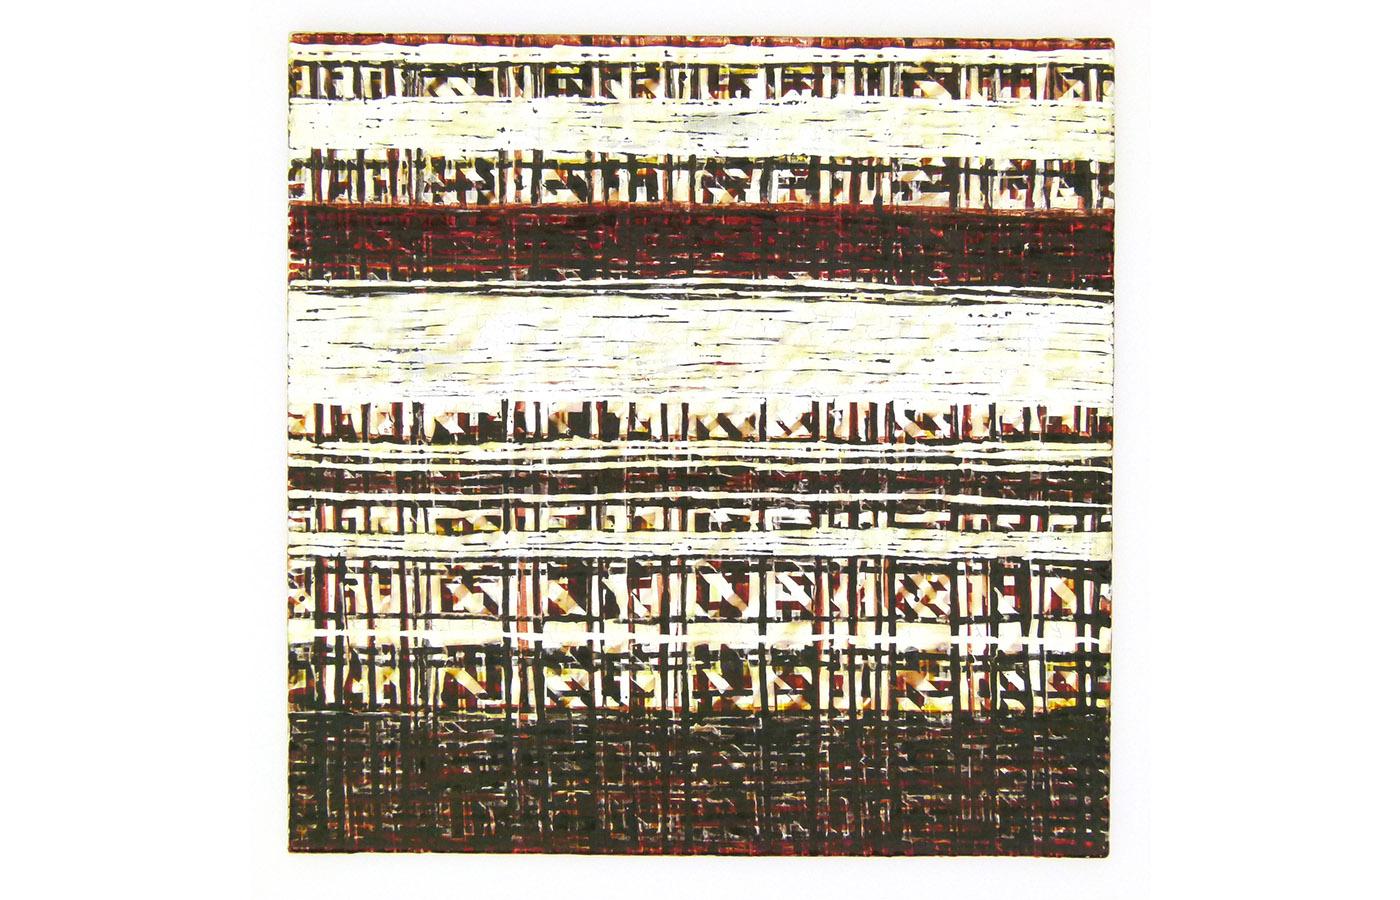 Linienbilder 3_0005_L1150005a